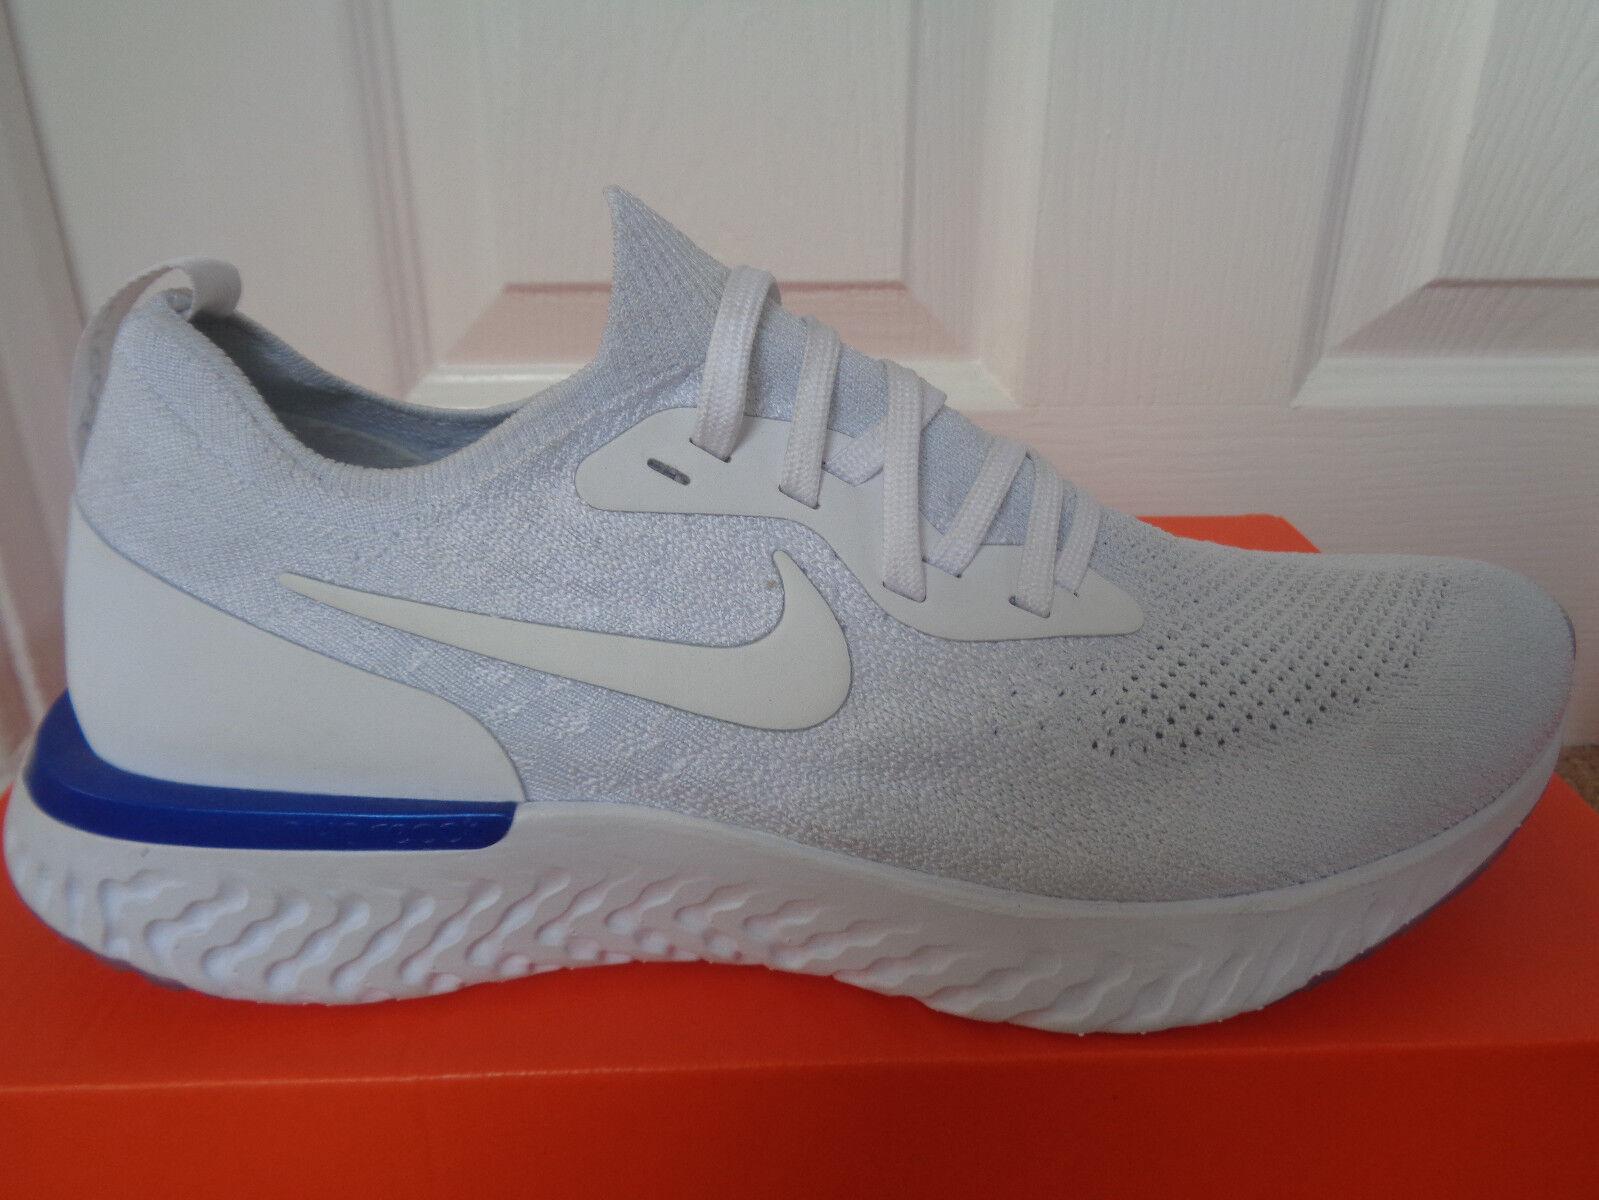 Nike Epic React Flyknit trainers shoes AQ0067 100 eu 43 us 9.5 NEW+BOX